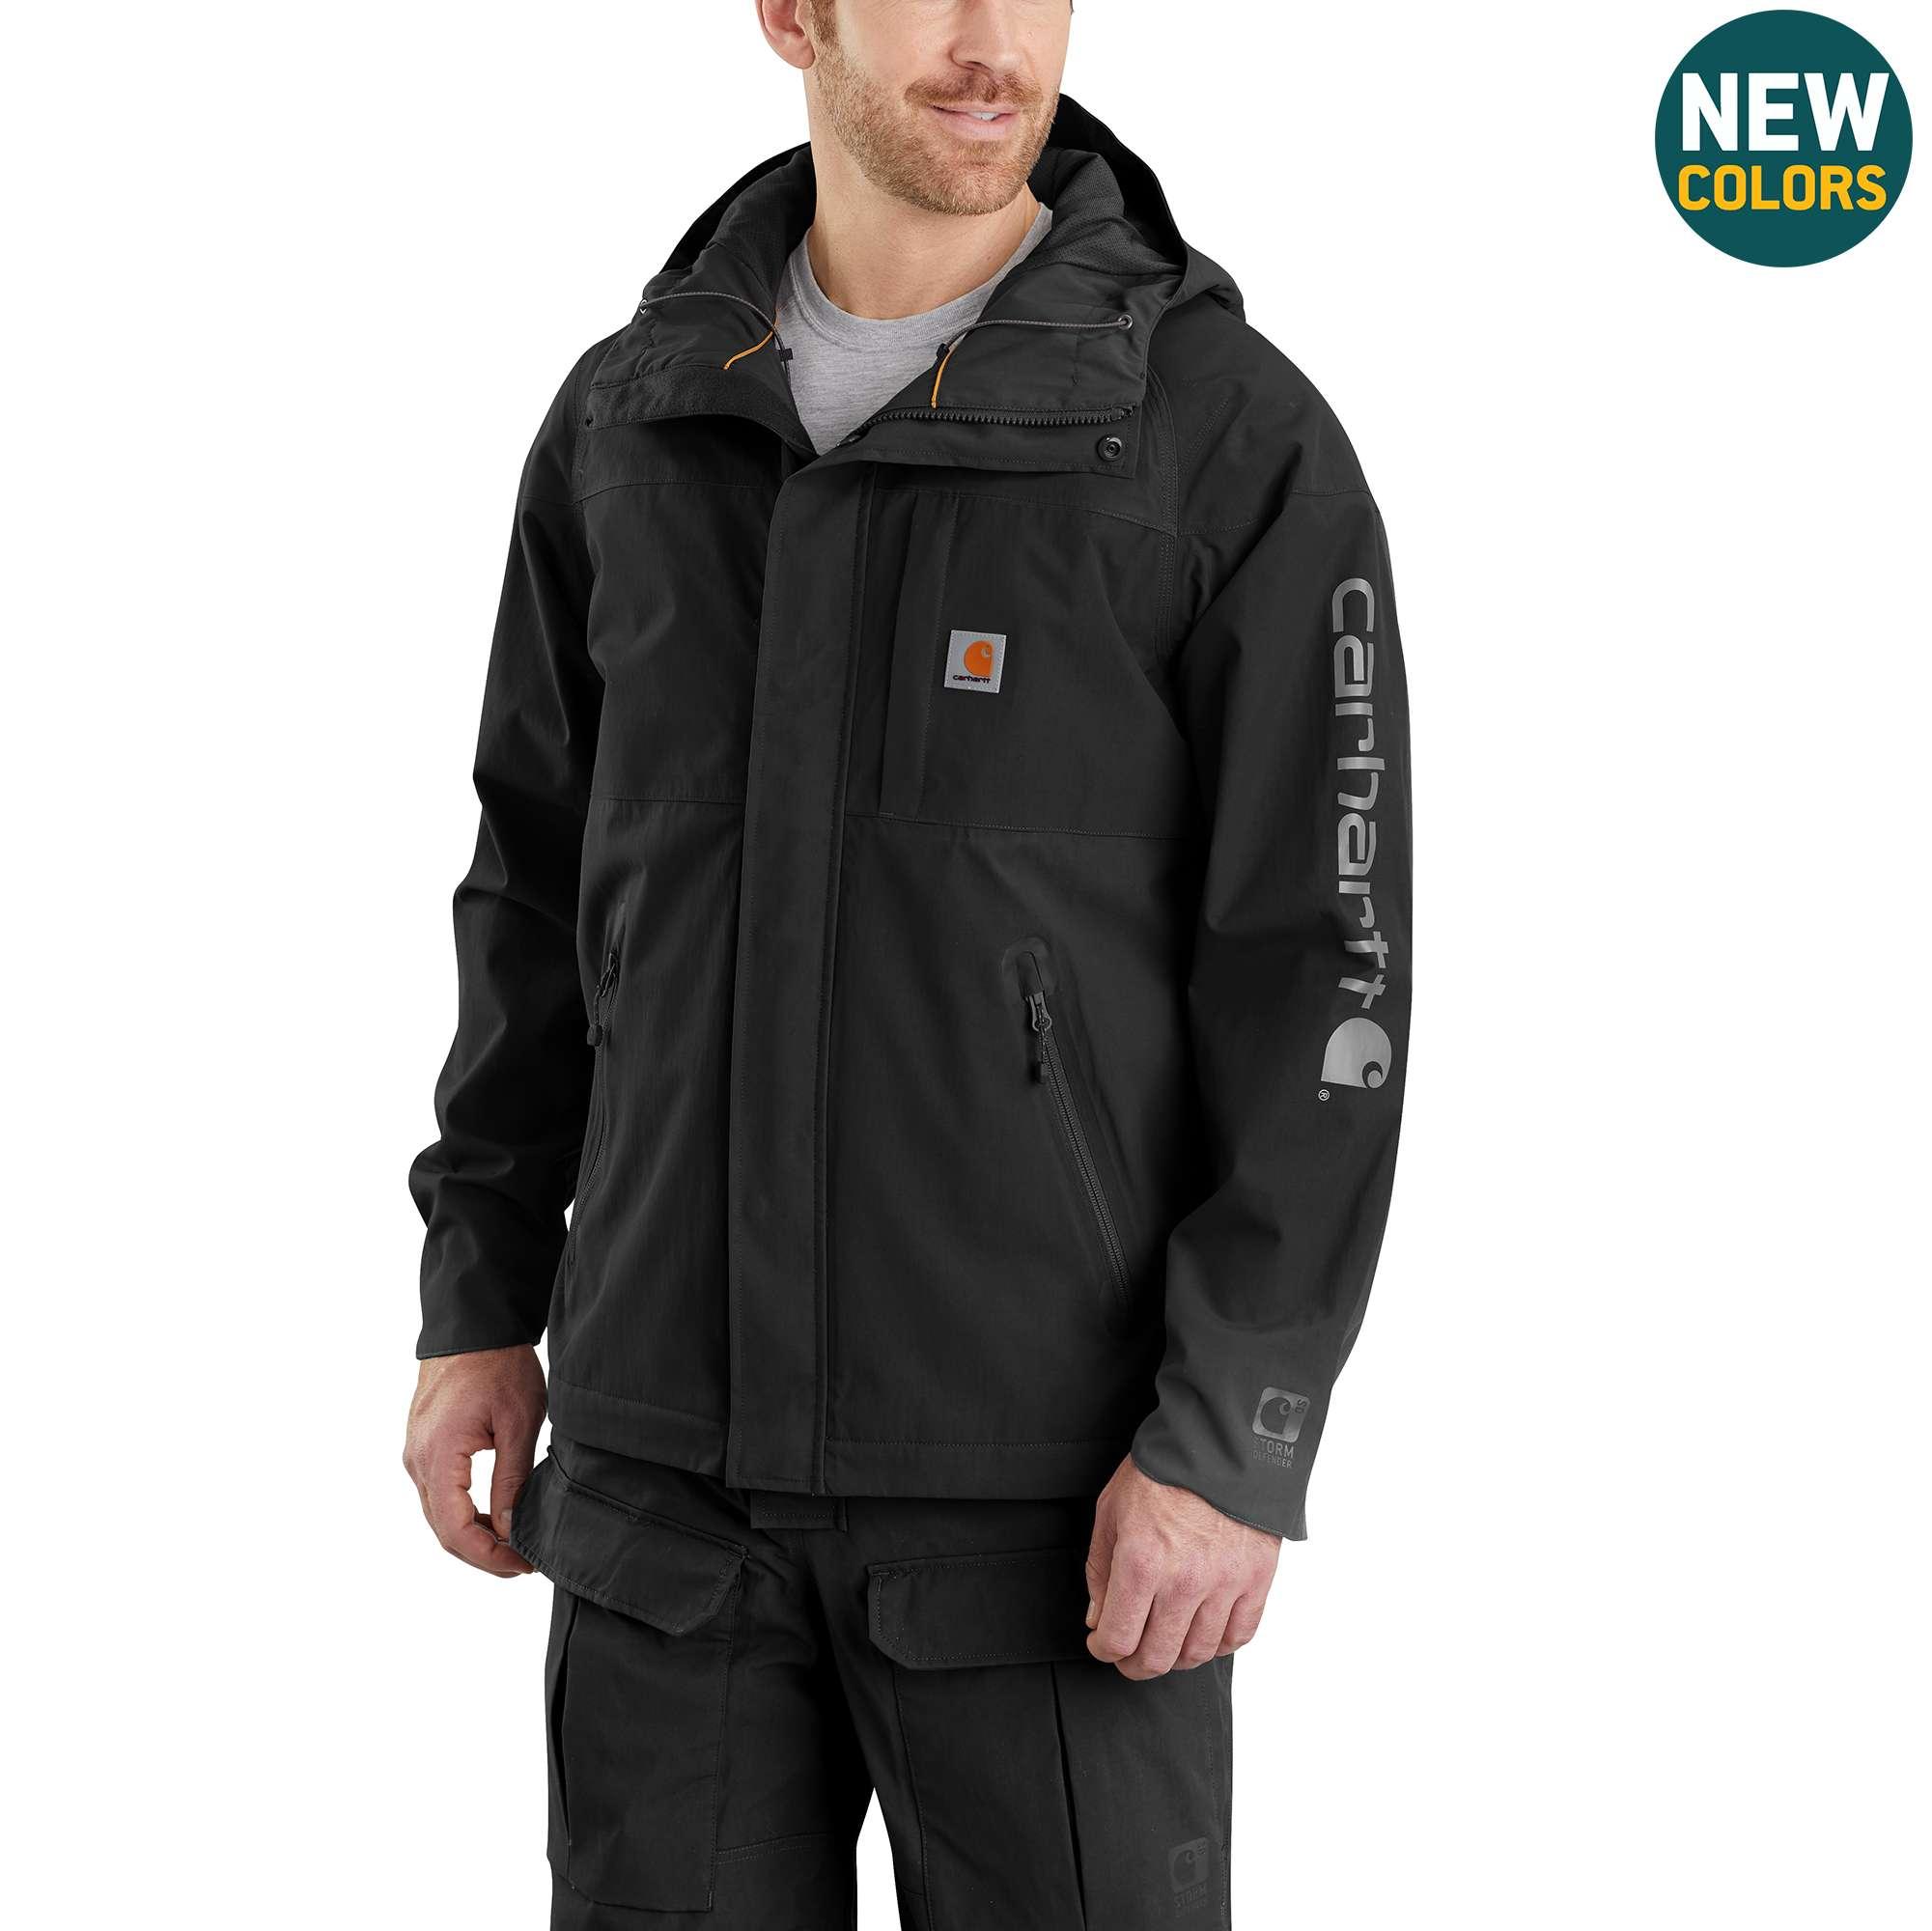 Carhartt Storm Defender Angler Jacket